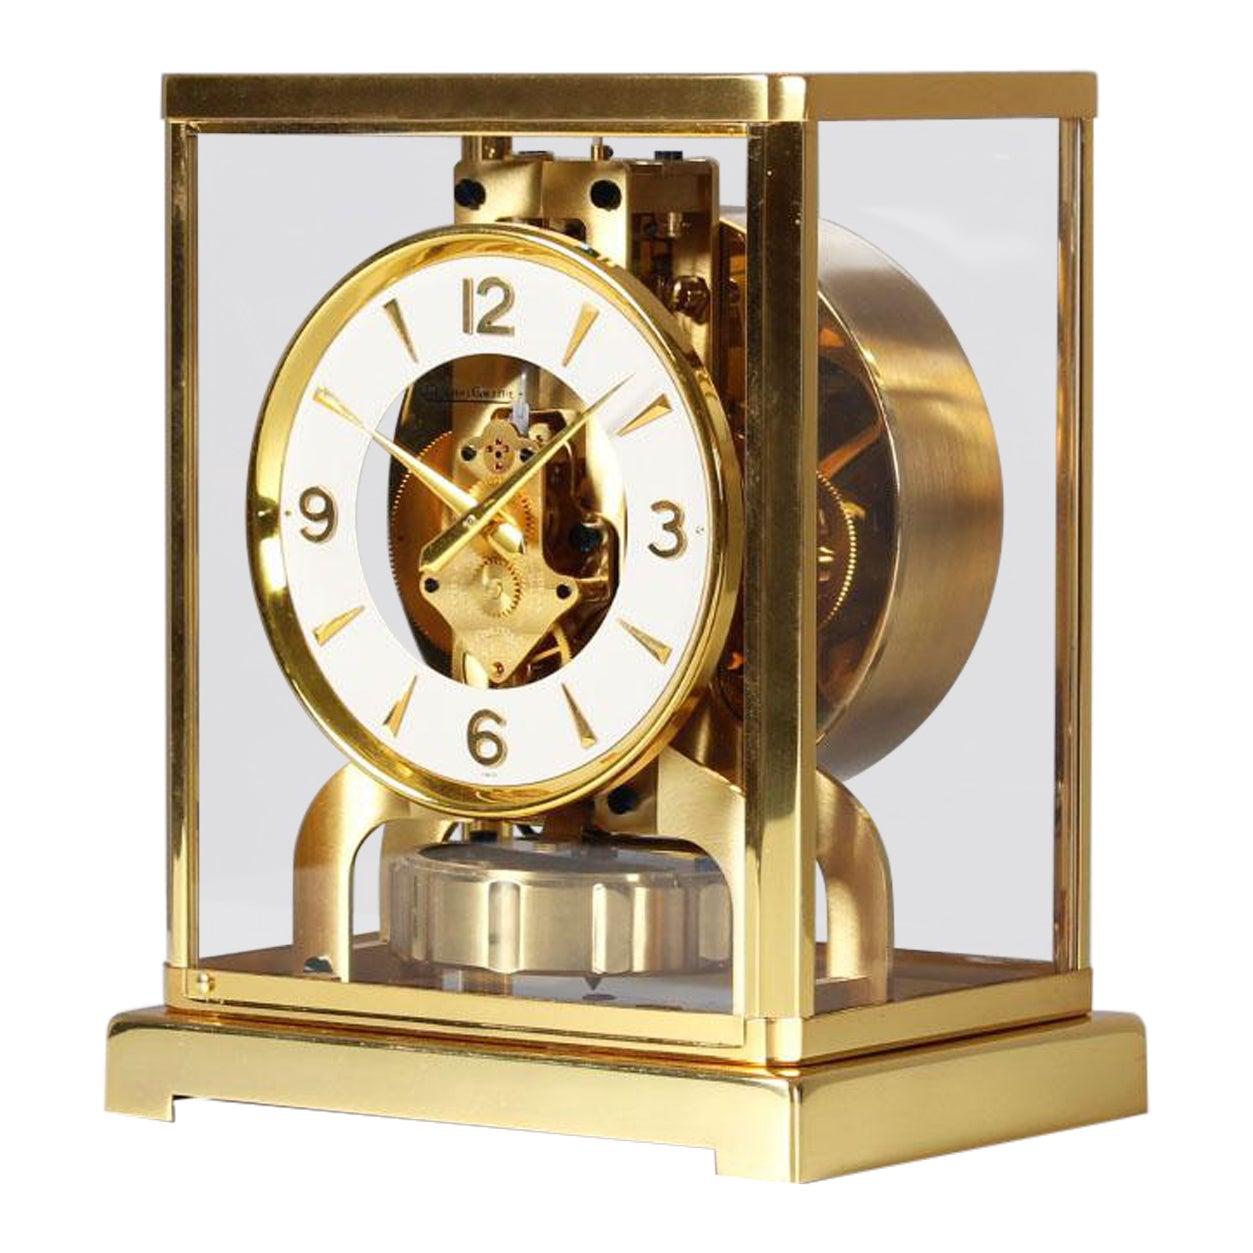 Jaeger LeCoultre, Atmos Clock v Classique from 1955